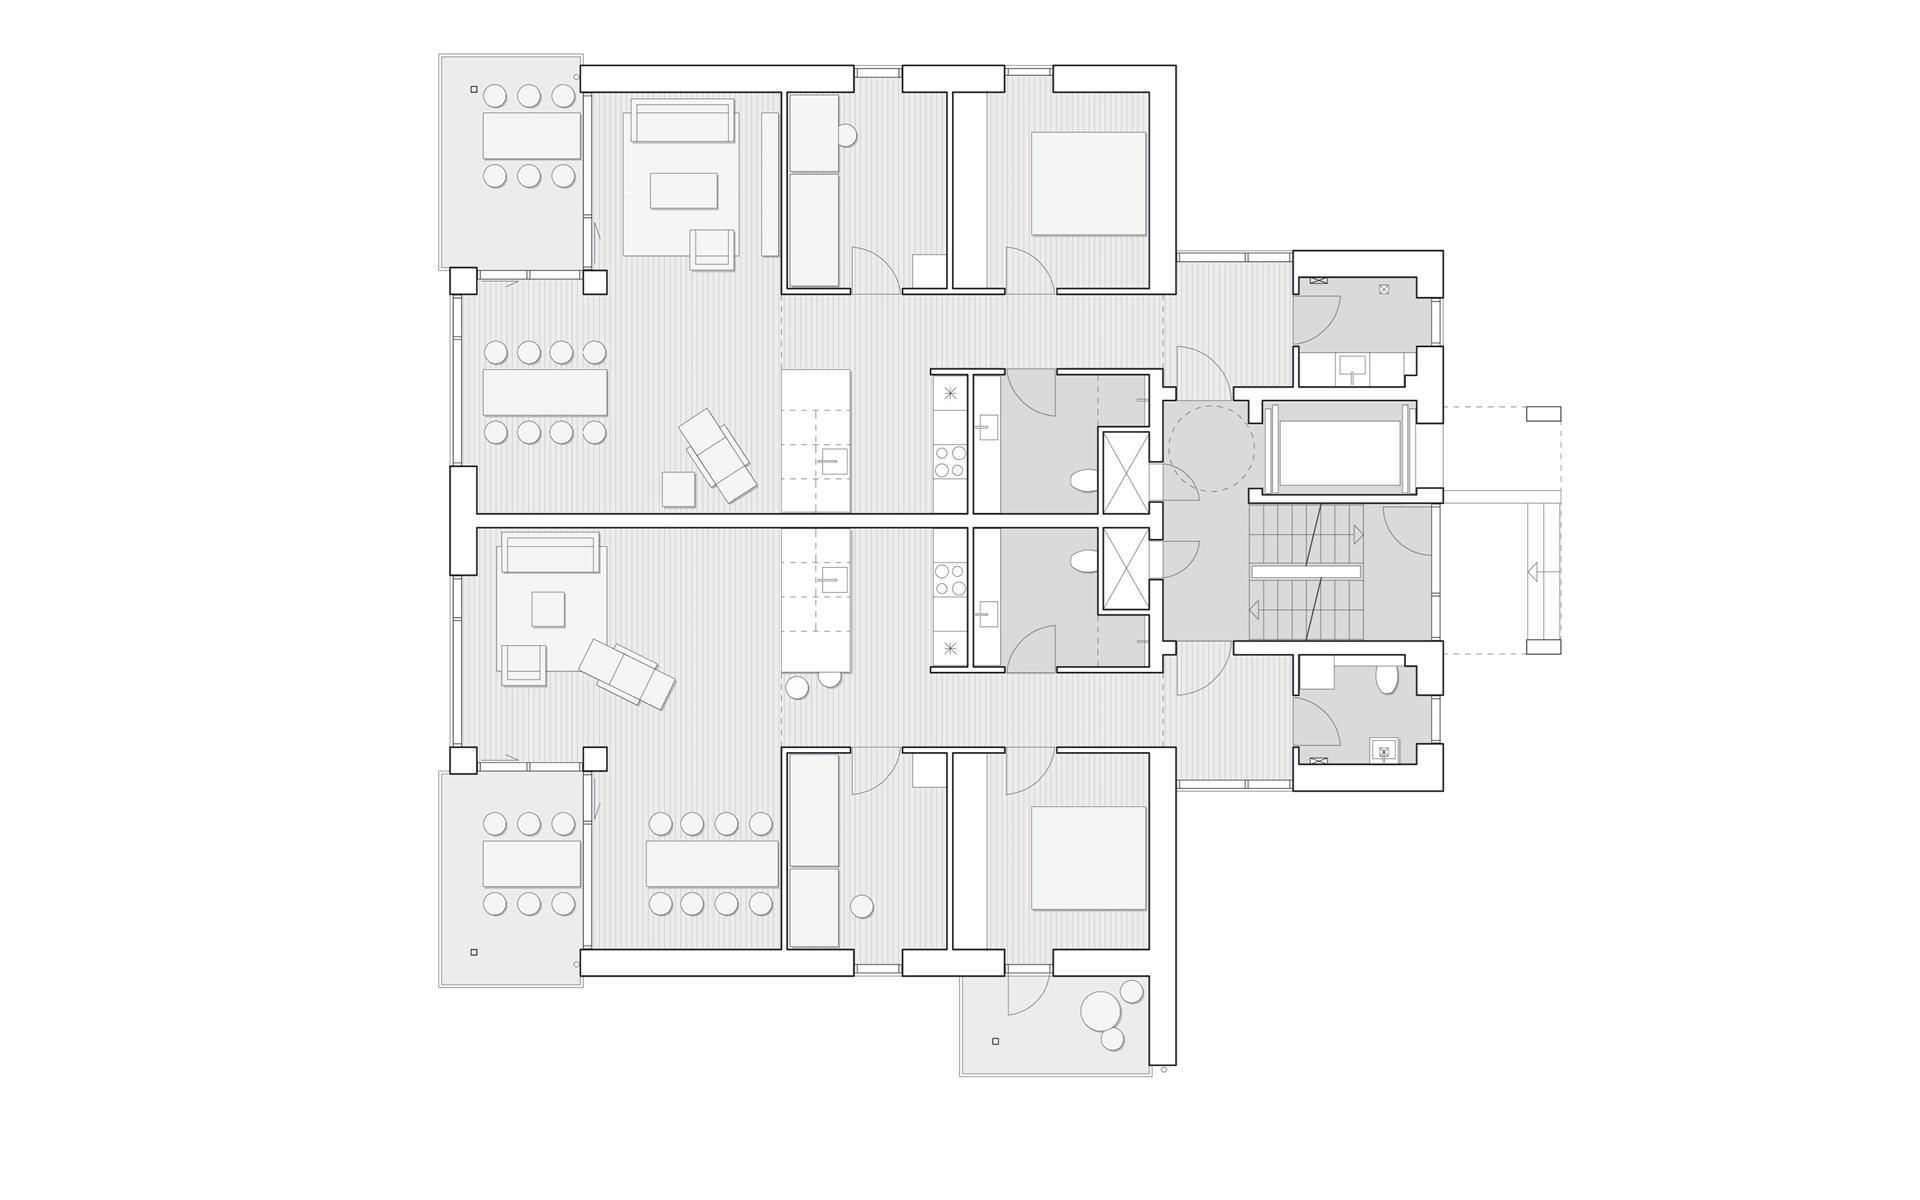 Fjordhuset Østerbakken - Plantegning